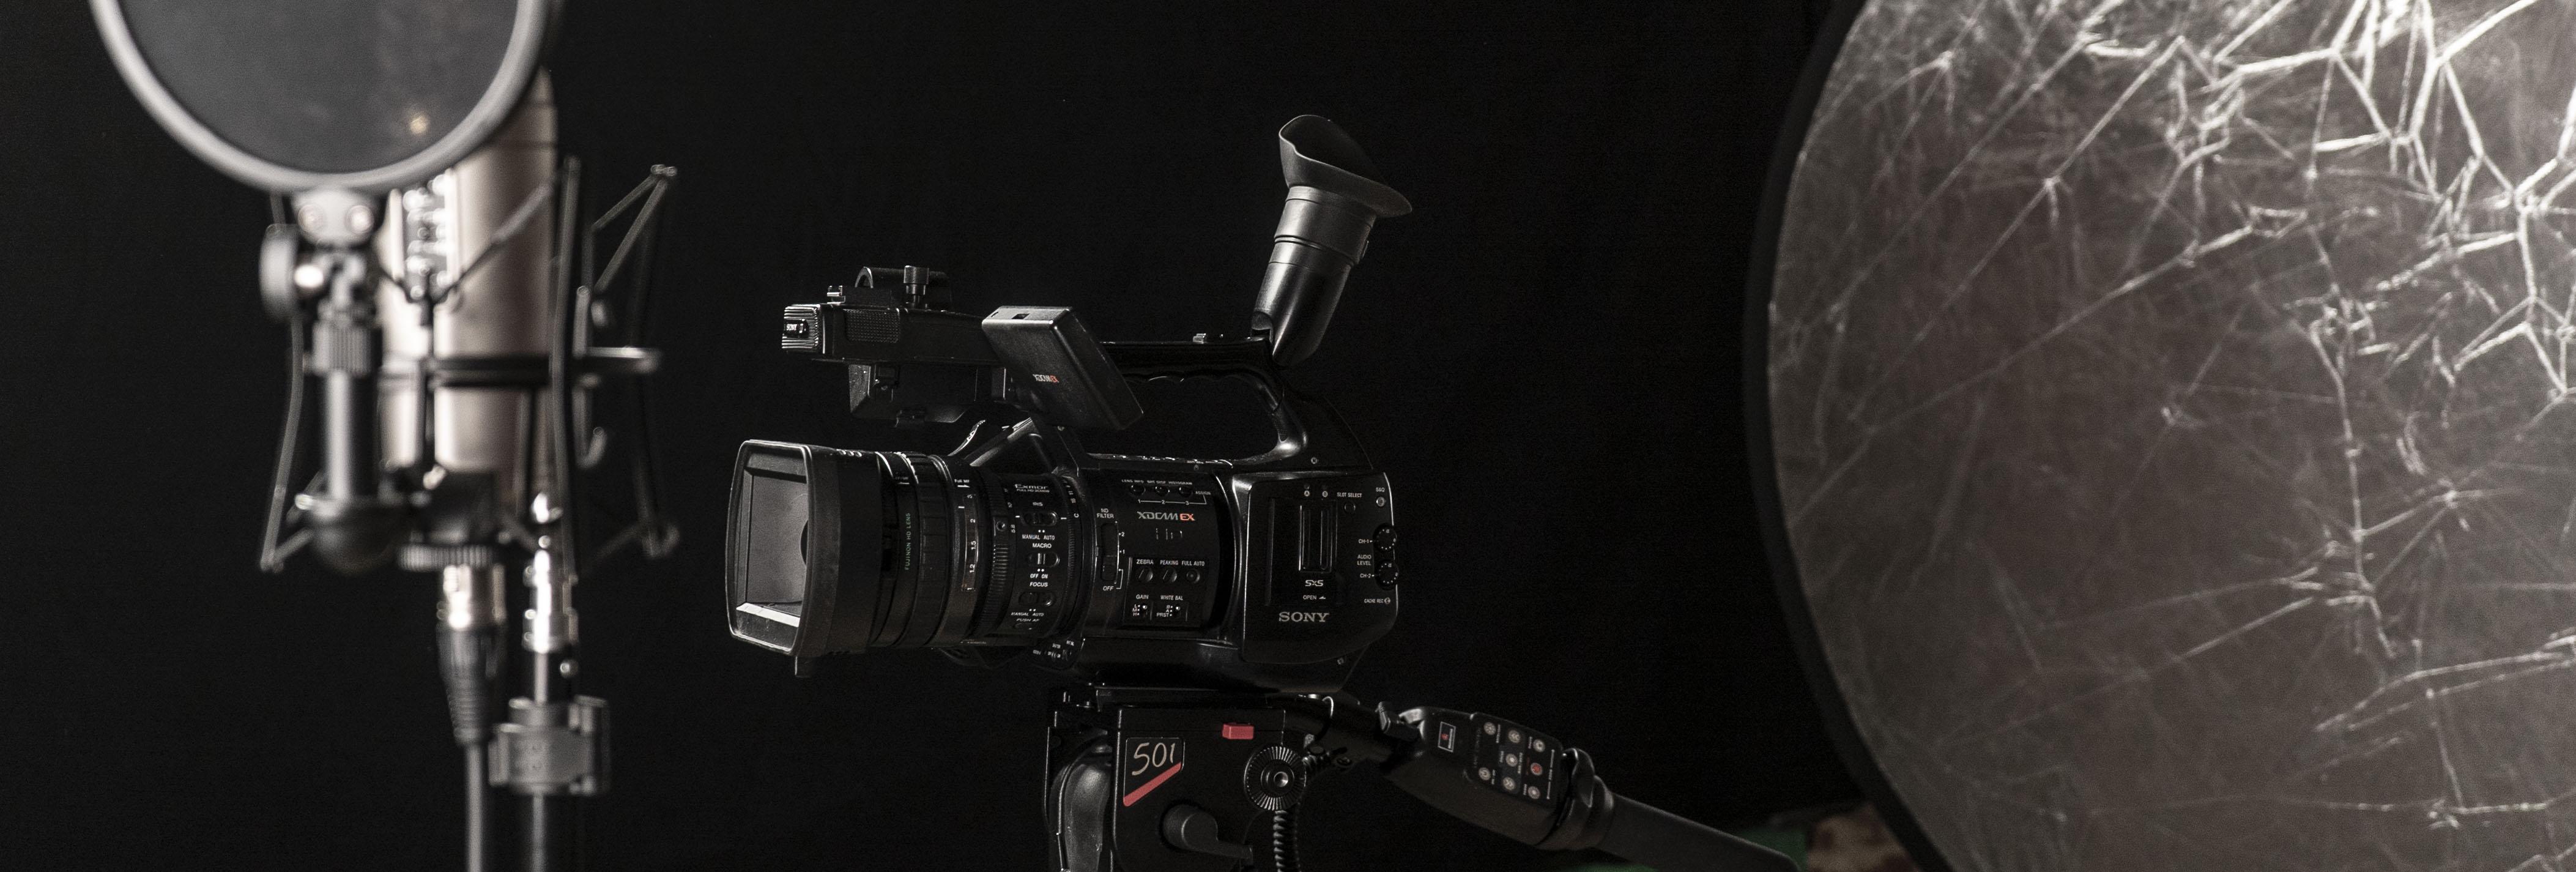 studio-mic-cam-bounce